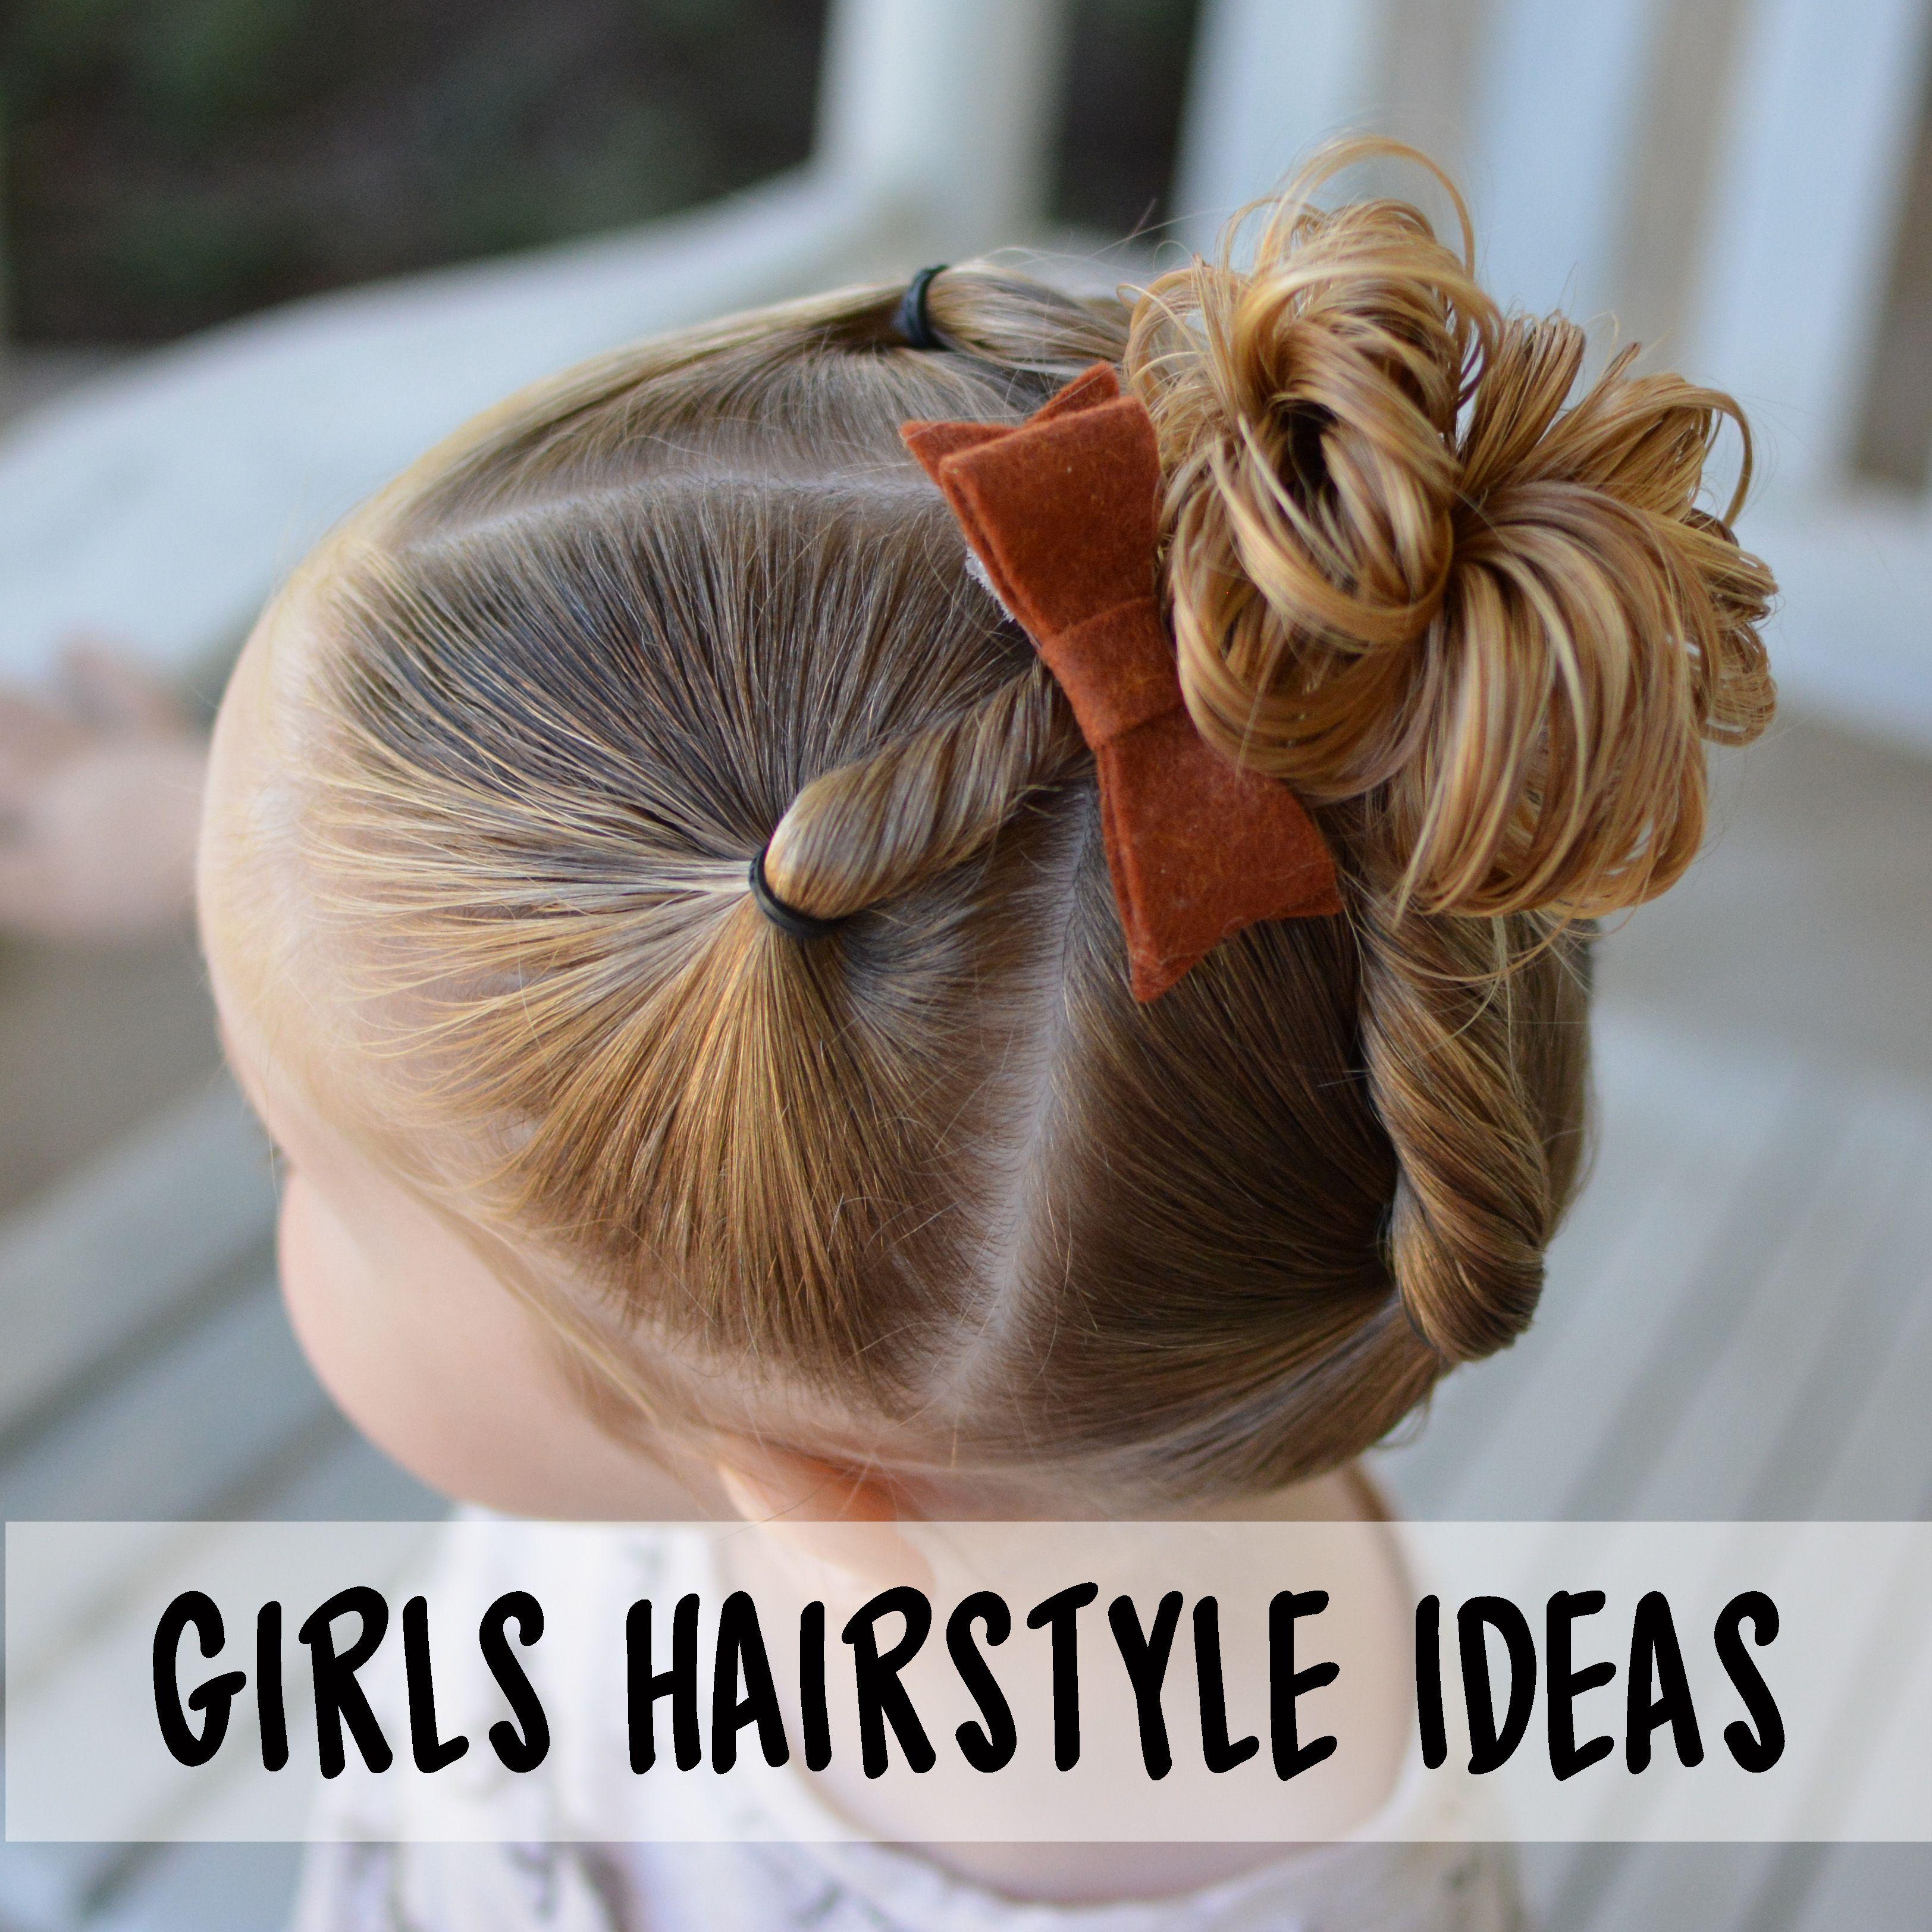 Kids haircut styles girls short cute ideas for girl hair  peinados de niñas  pinterest  girl